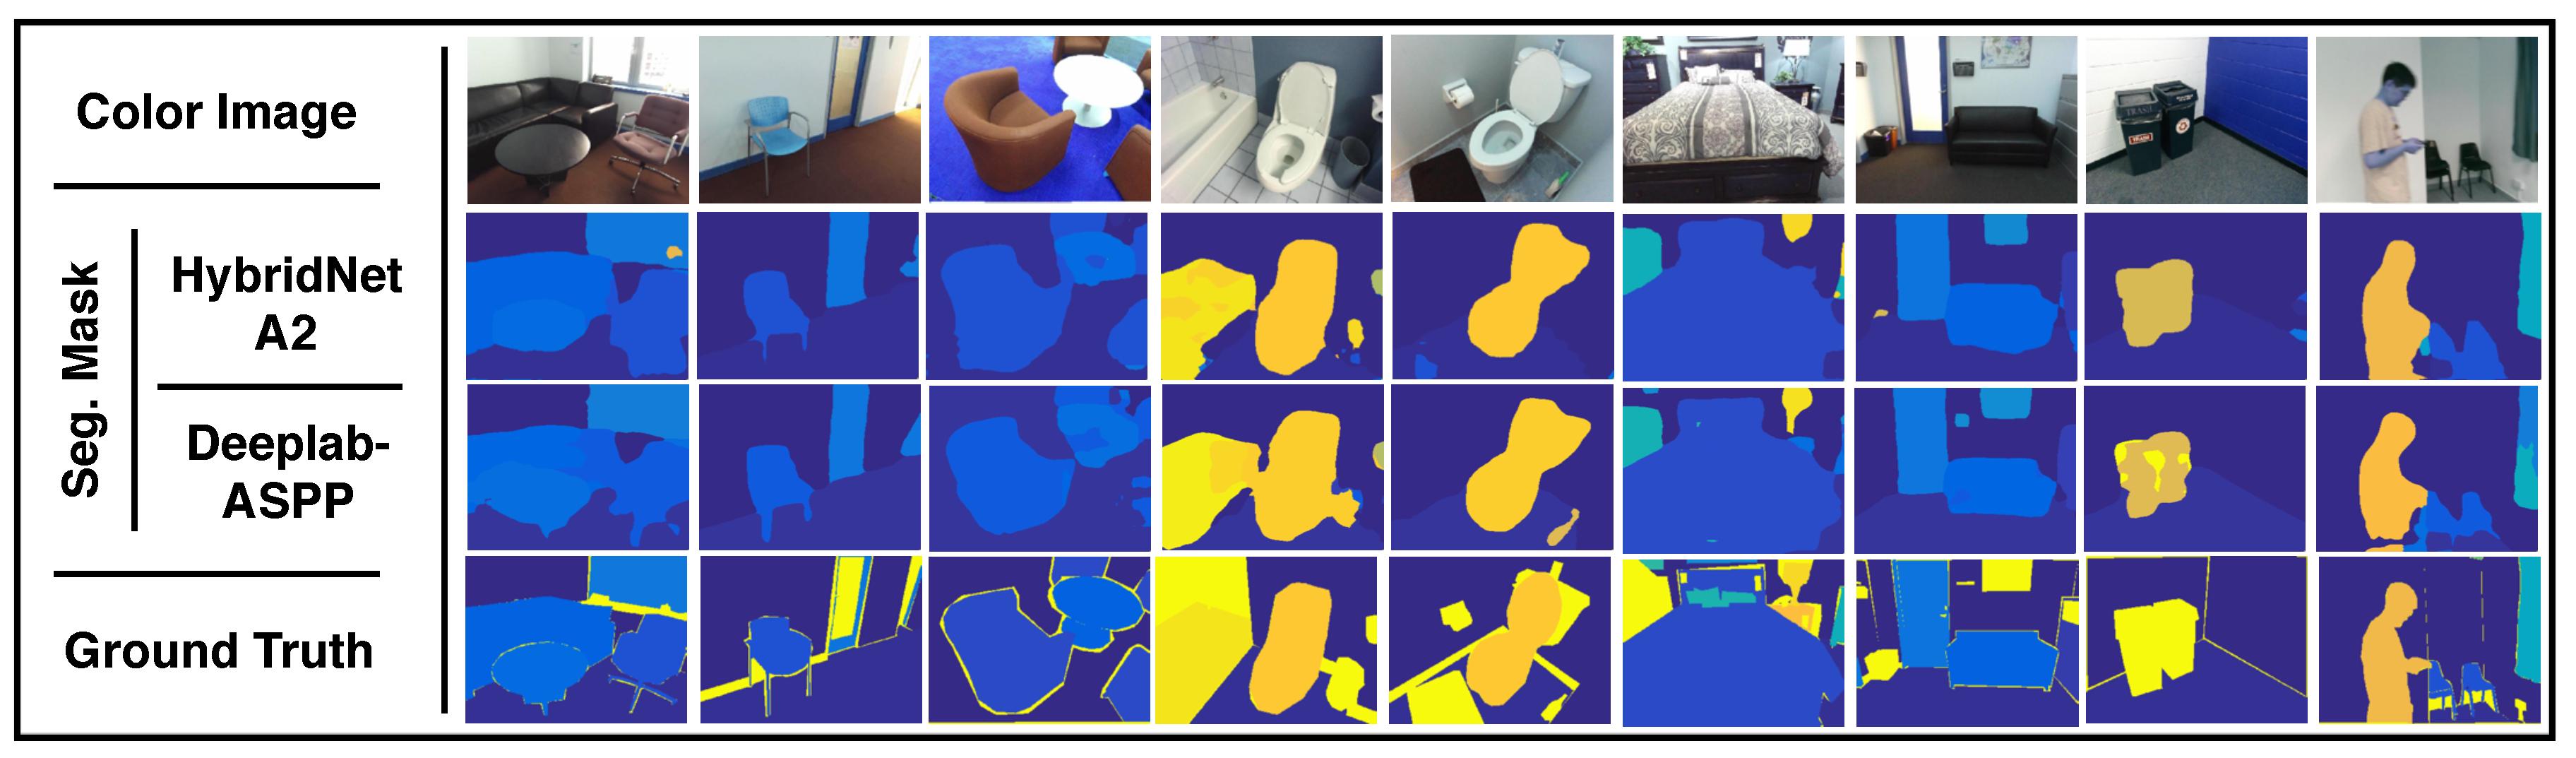 Sensors | Free Full-Text | Depth Estimation and Semantic